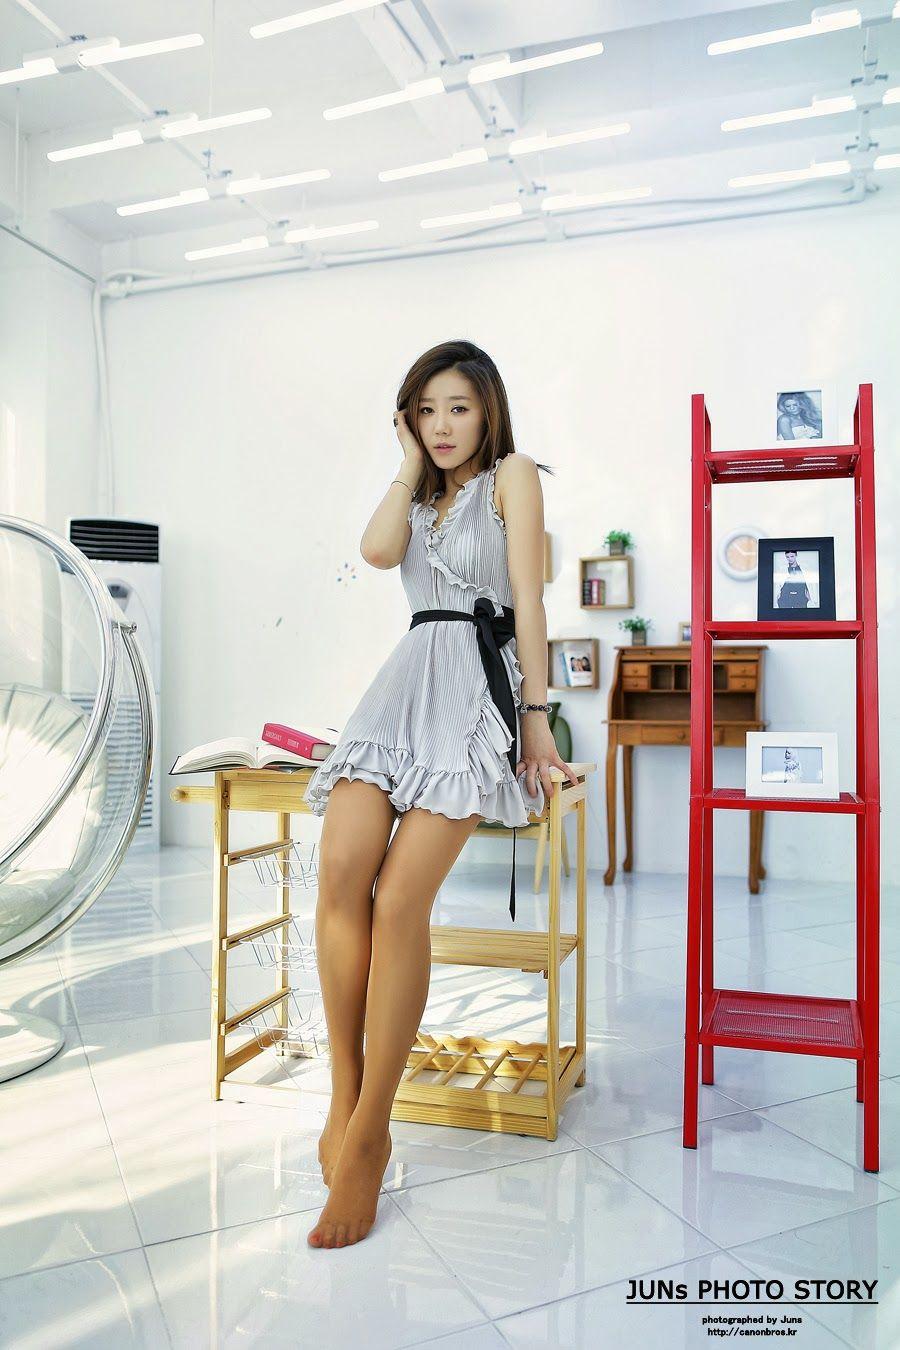 Lee Hyo Young - Google 検索